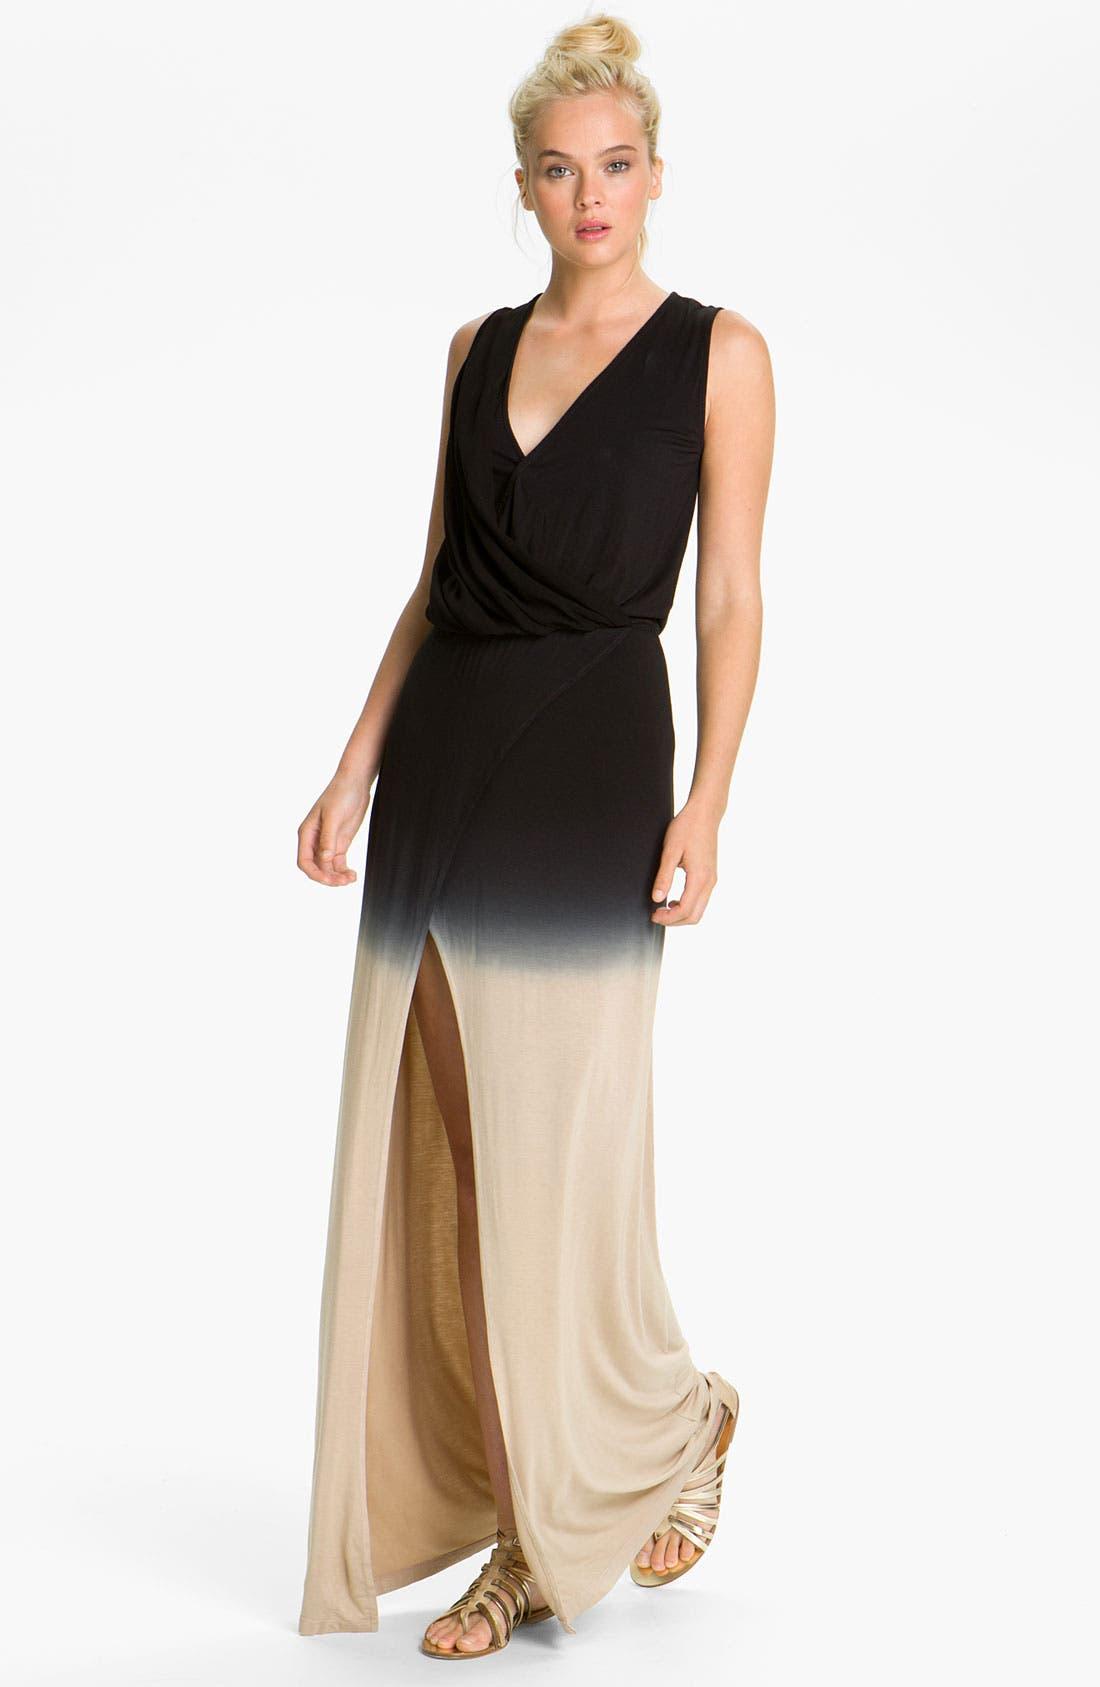 Alternate Image 1 Selected - Young, Fabulous & Broke 'Arroyo' Ombré Maxi Dress